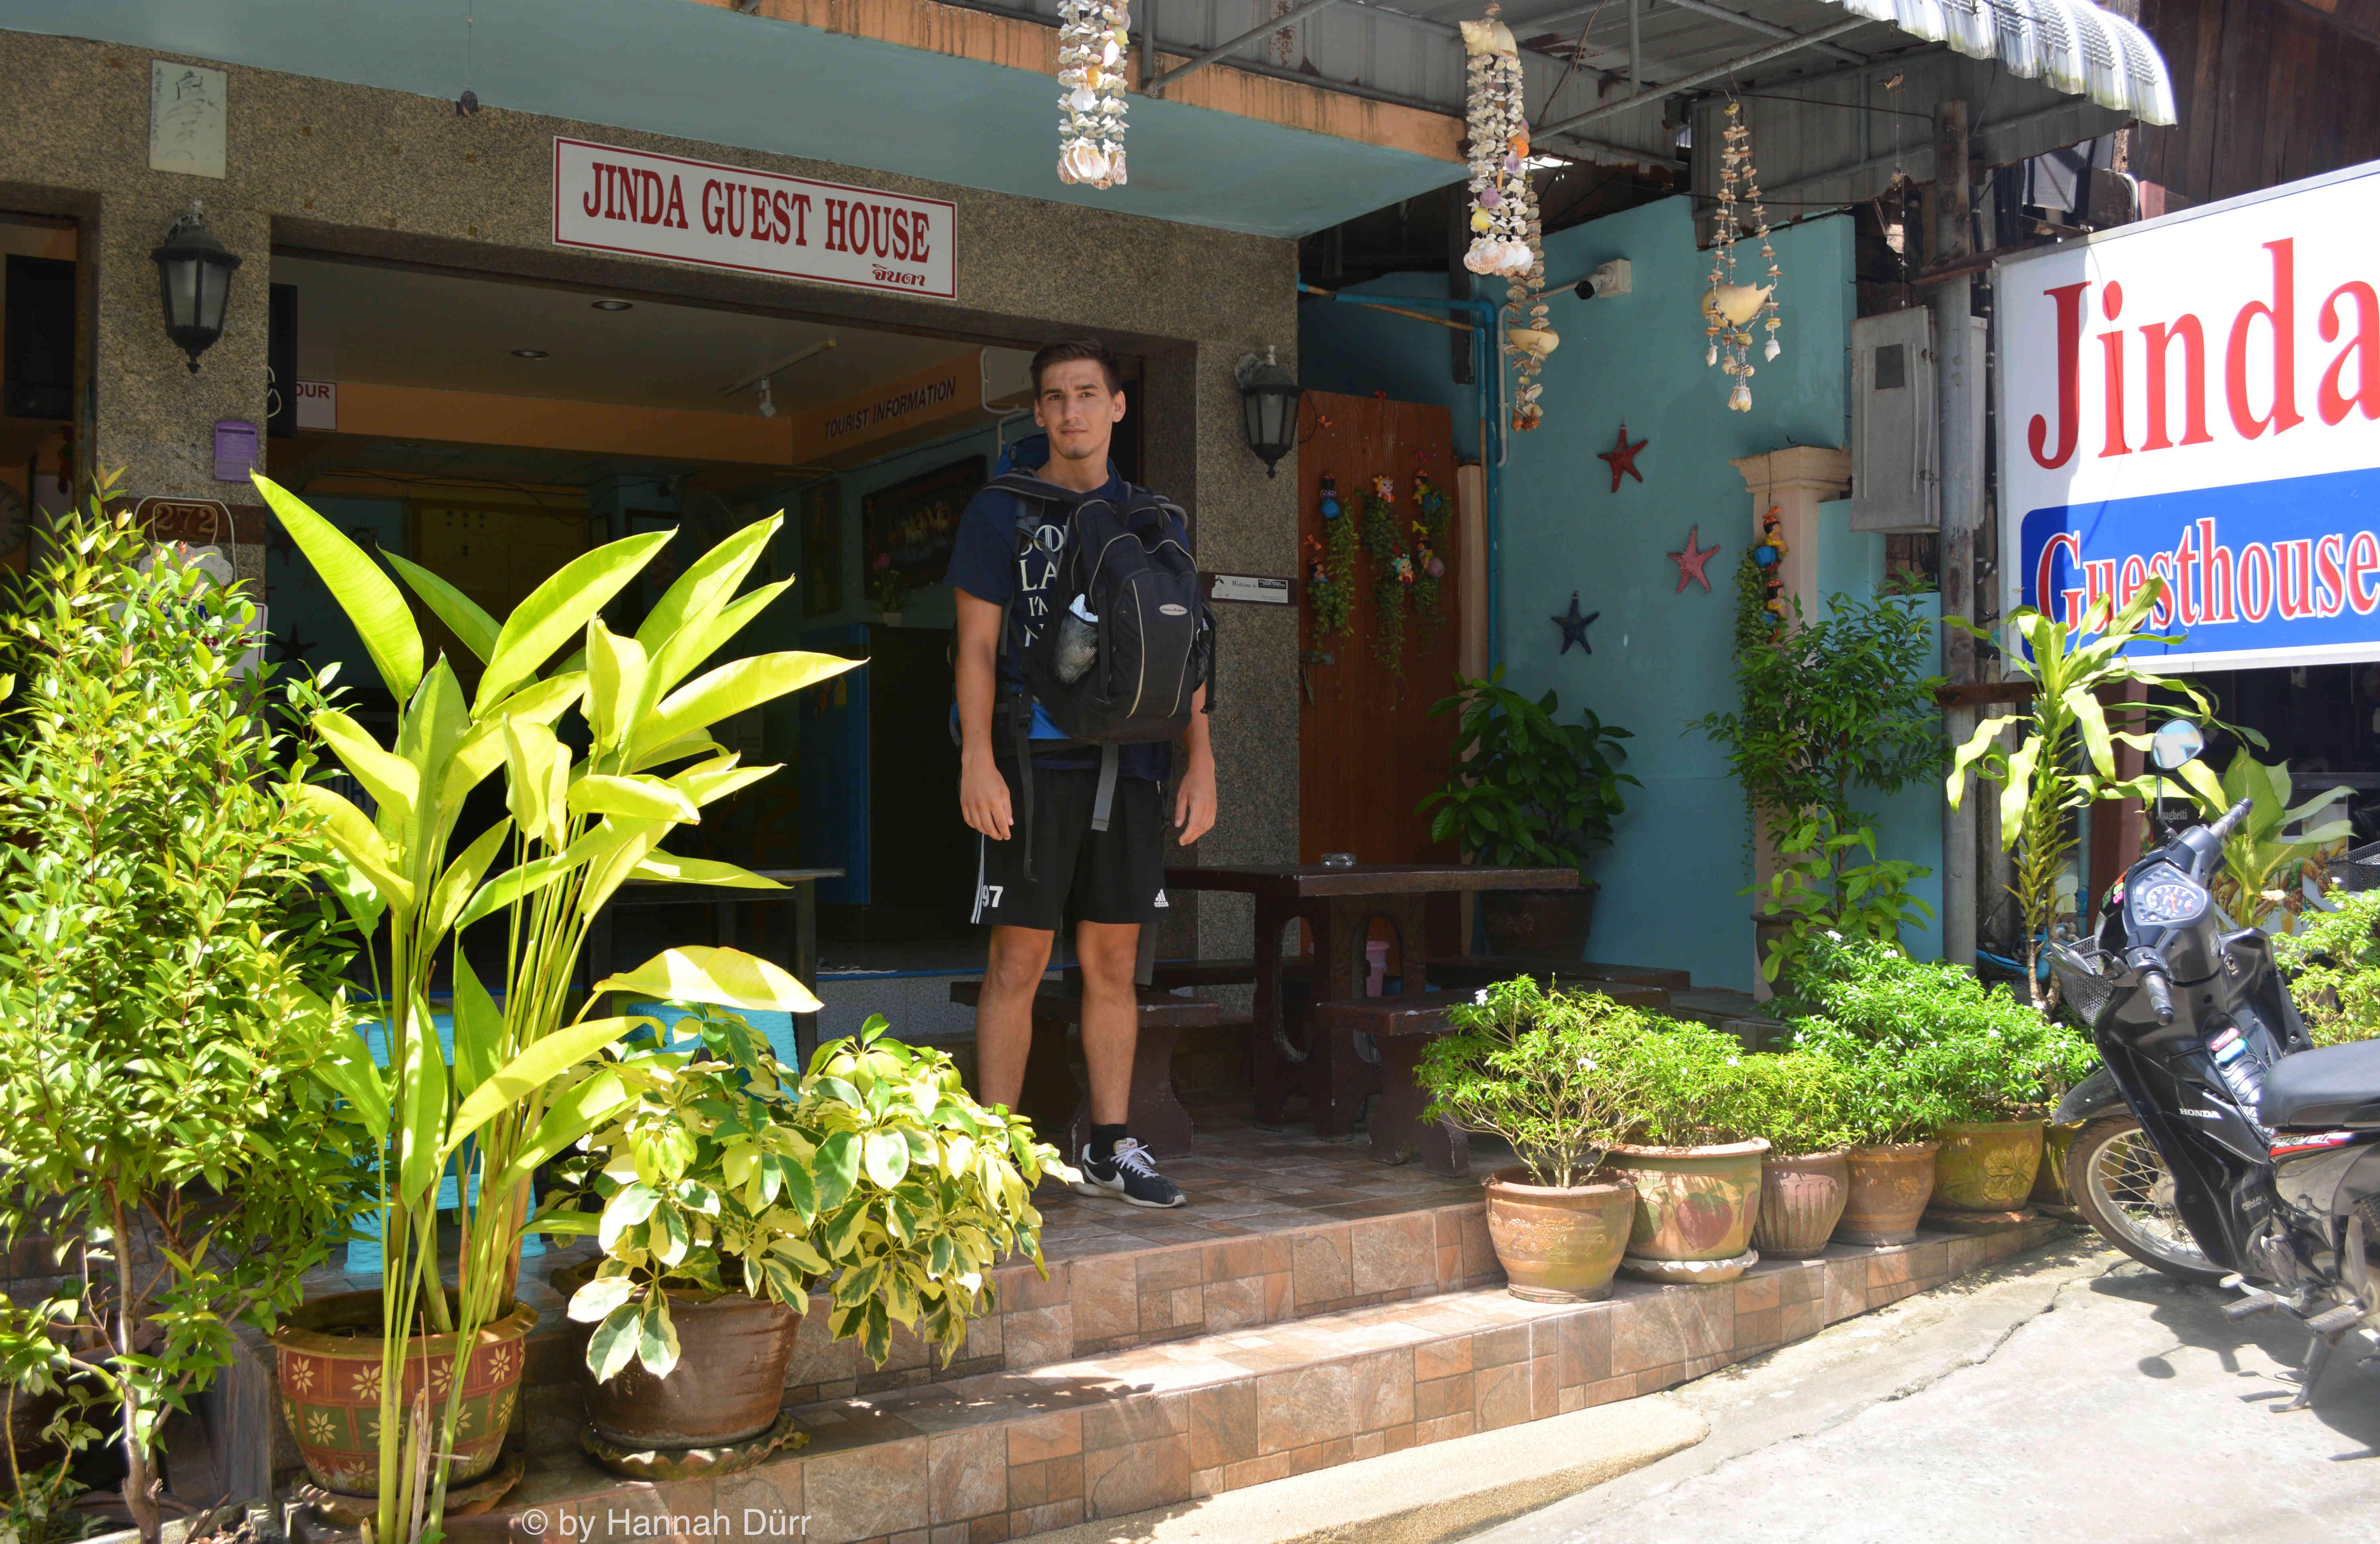 jinda guesthouse aonang, Thailand